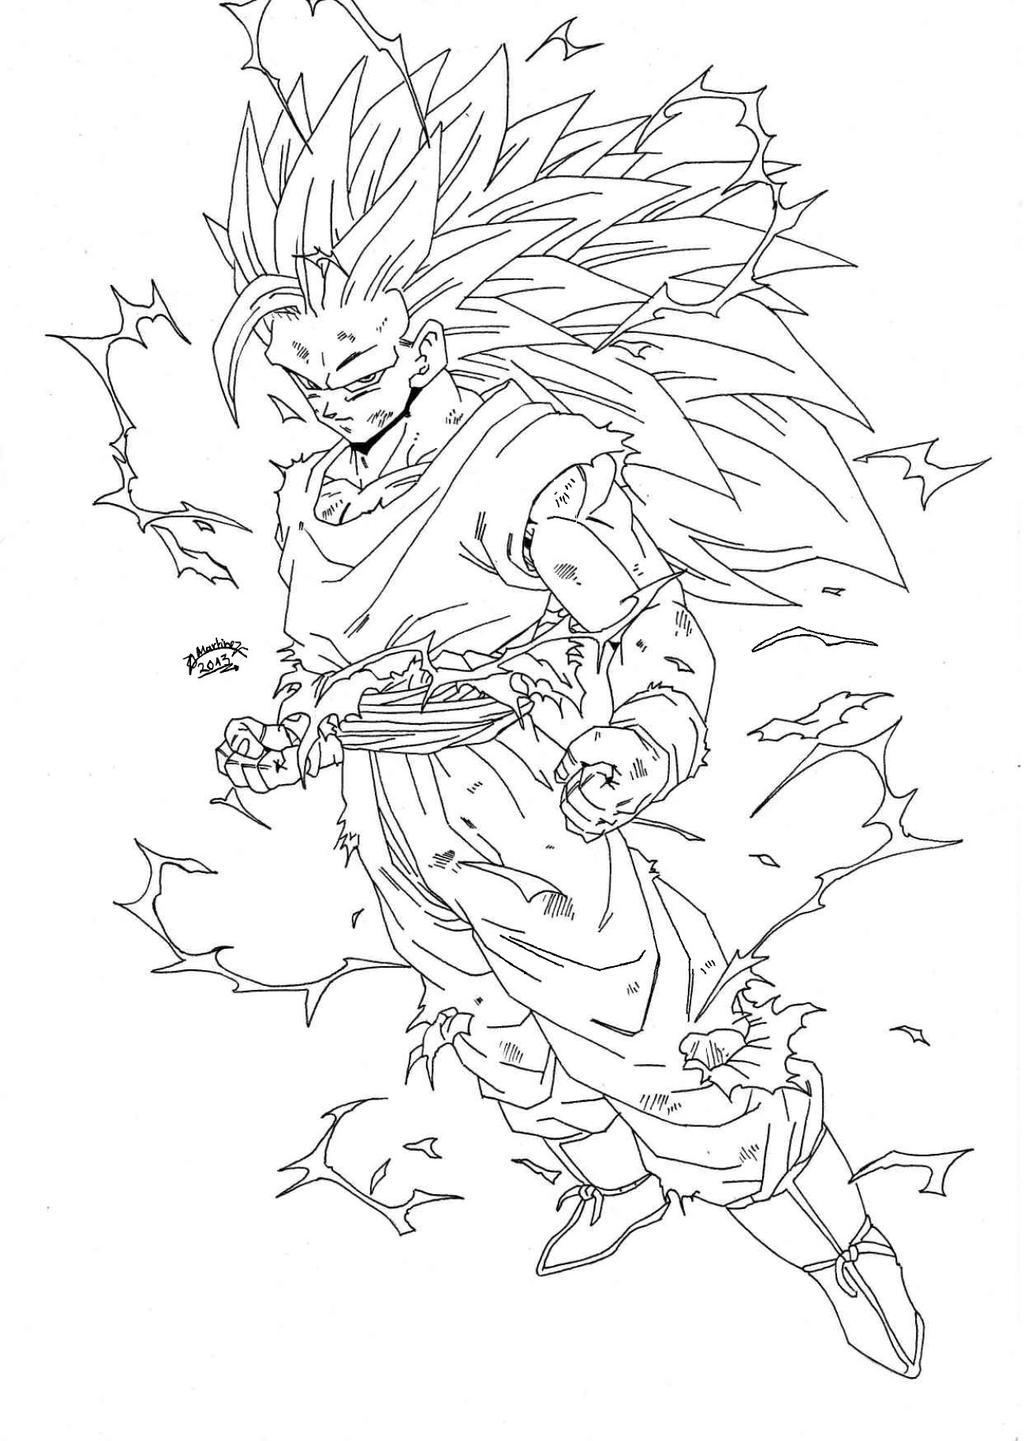 goku super saiyan coloring pages - dragonball z regreso goku super sayan 3 lineart by